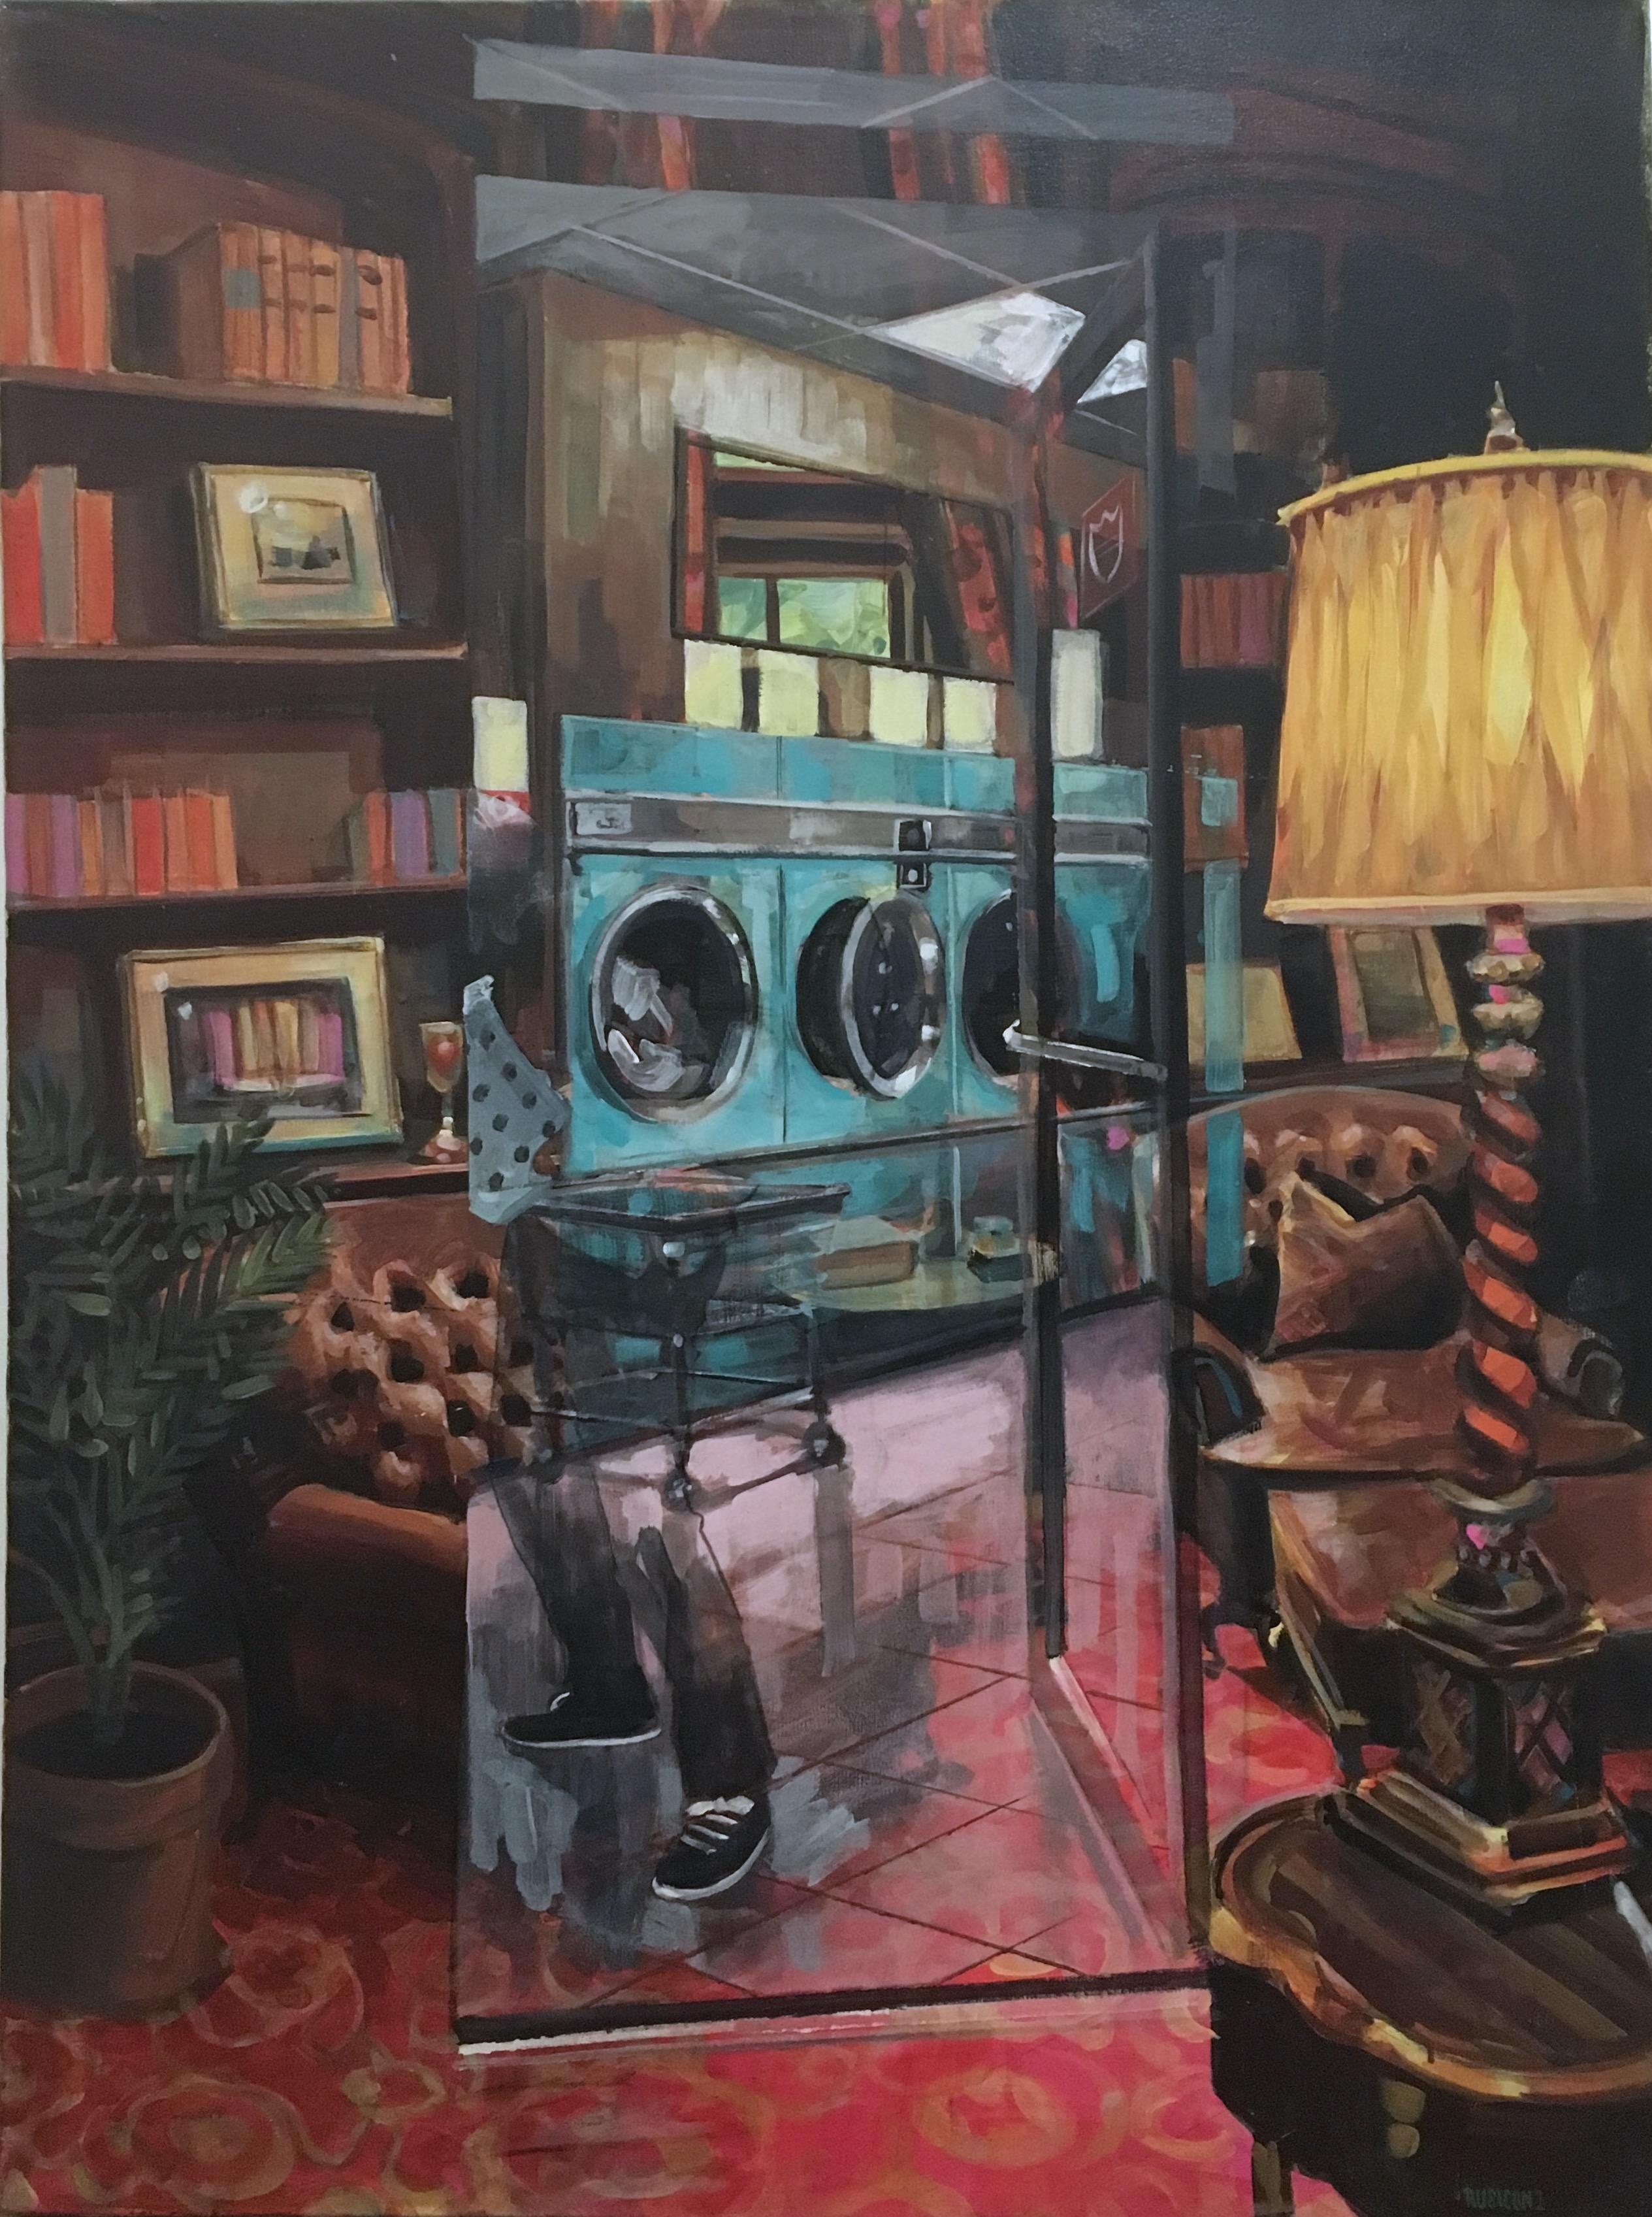 Living Room, 2017, figurative, interior, wood, library, Barcelona, street art